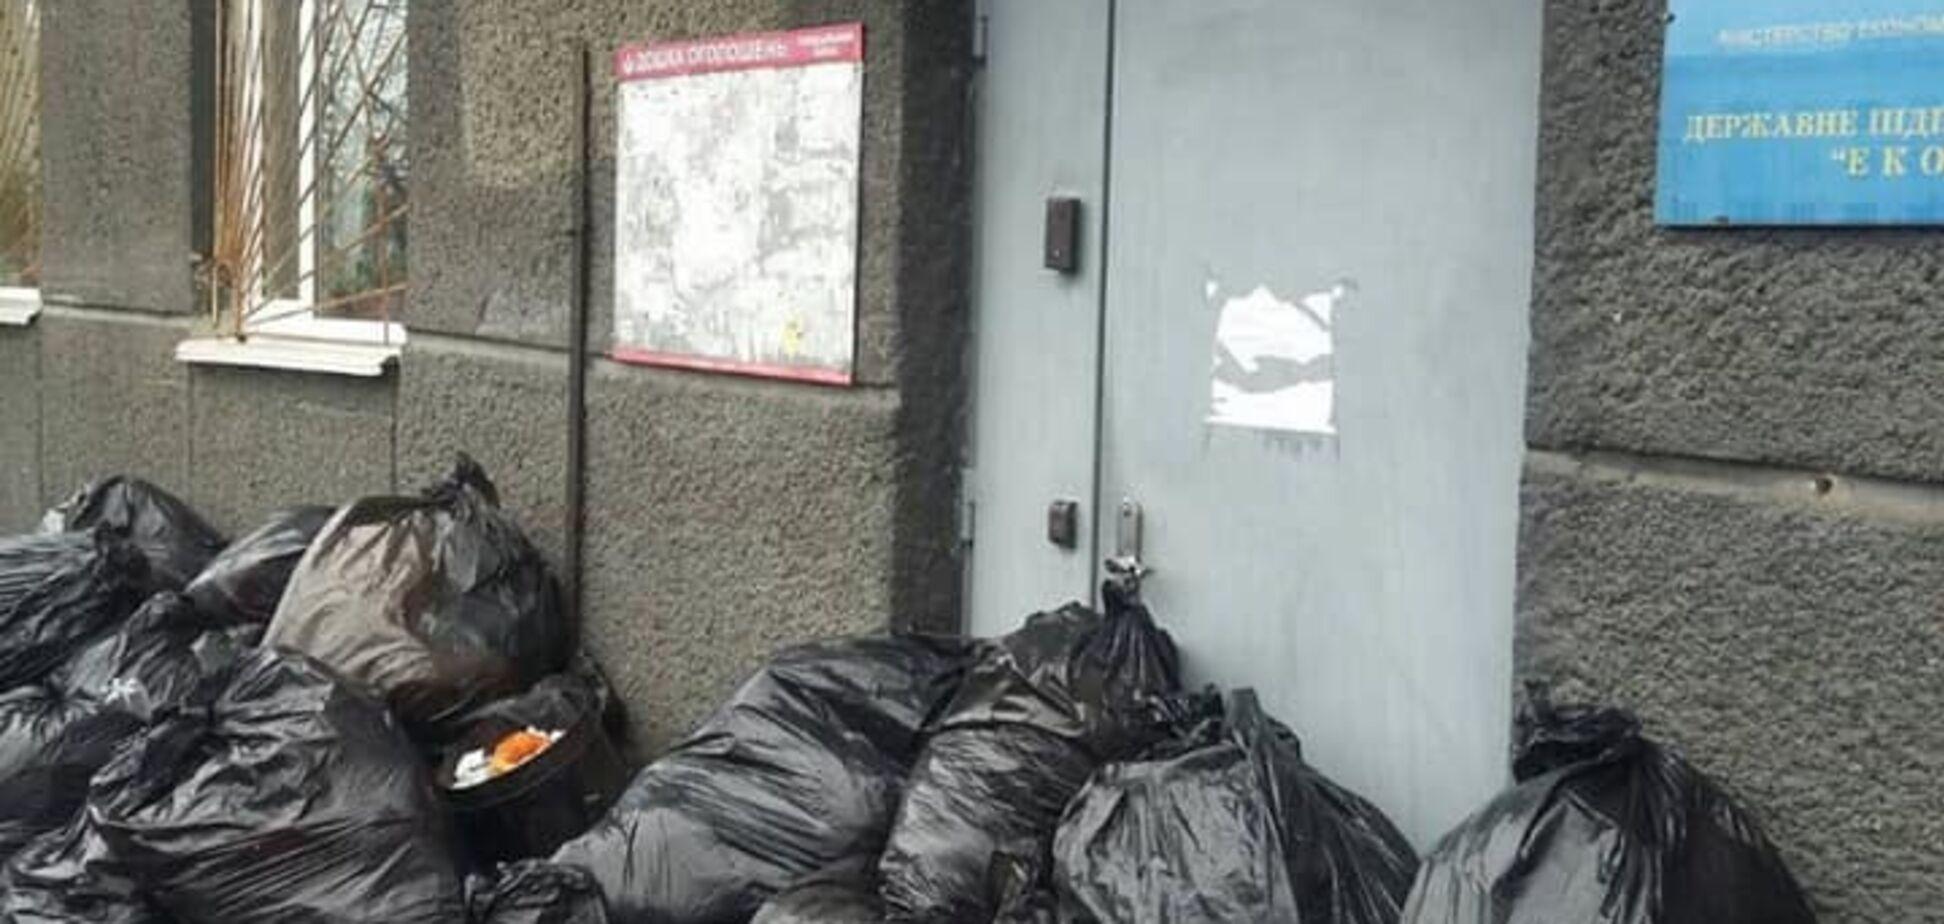 Помстилися: кияни завалили ЖЕК на Печерську сміттям